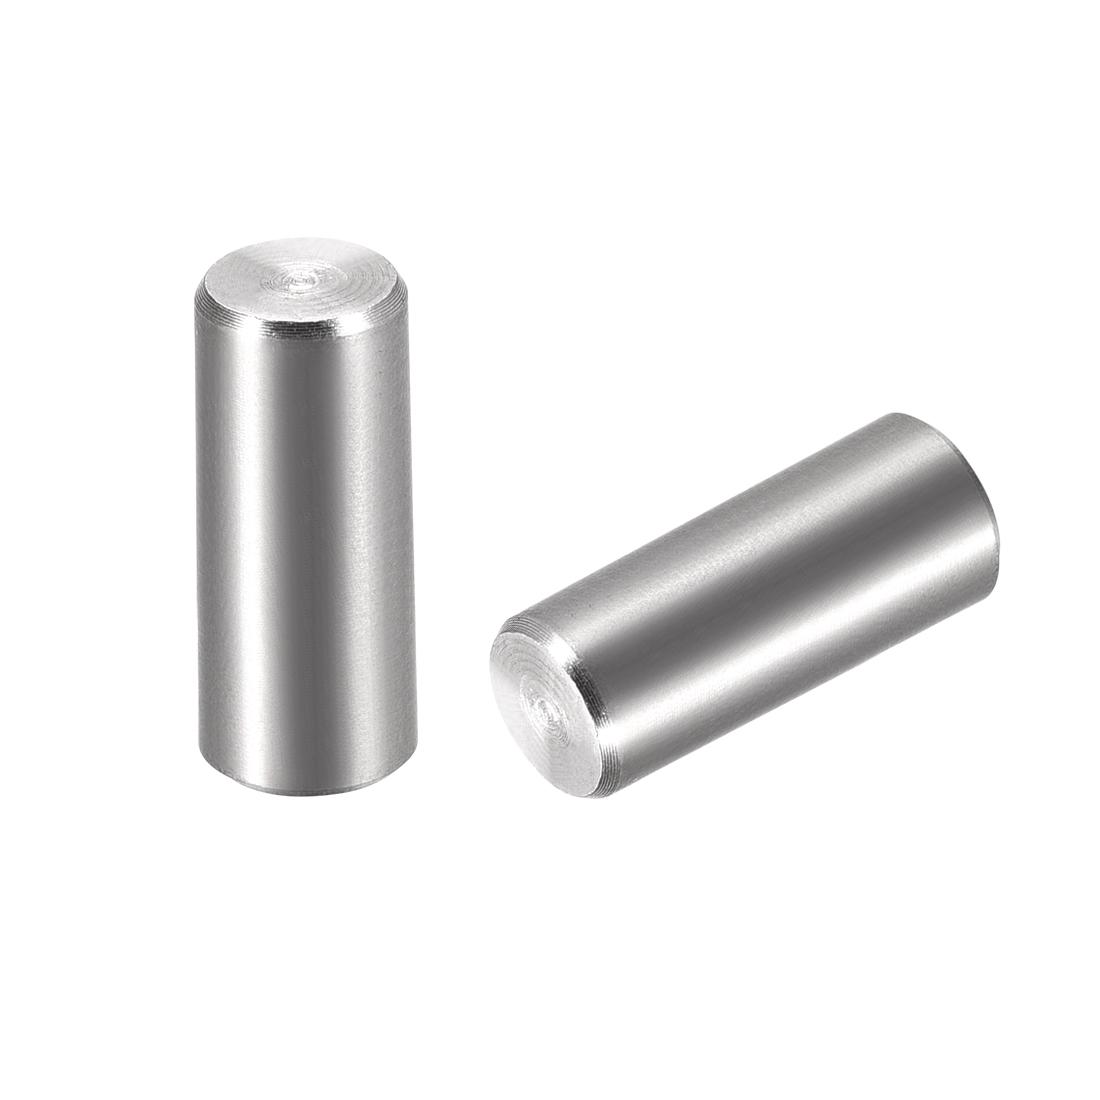 2Pcs 8mm x 20mm 1:50 Taper Pin 304 Stainless Steel Shelf Support Pin Fasten